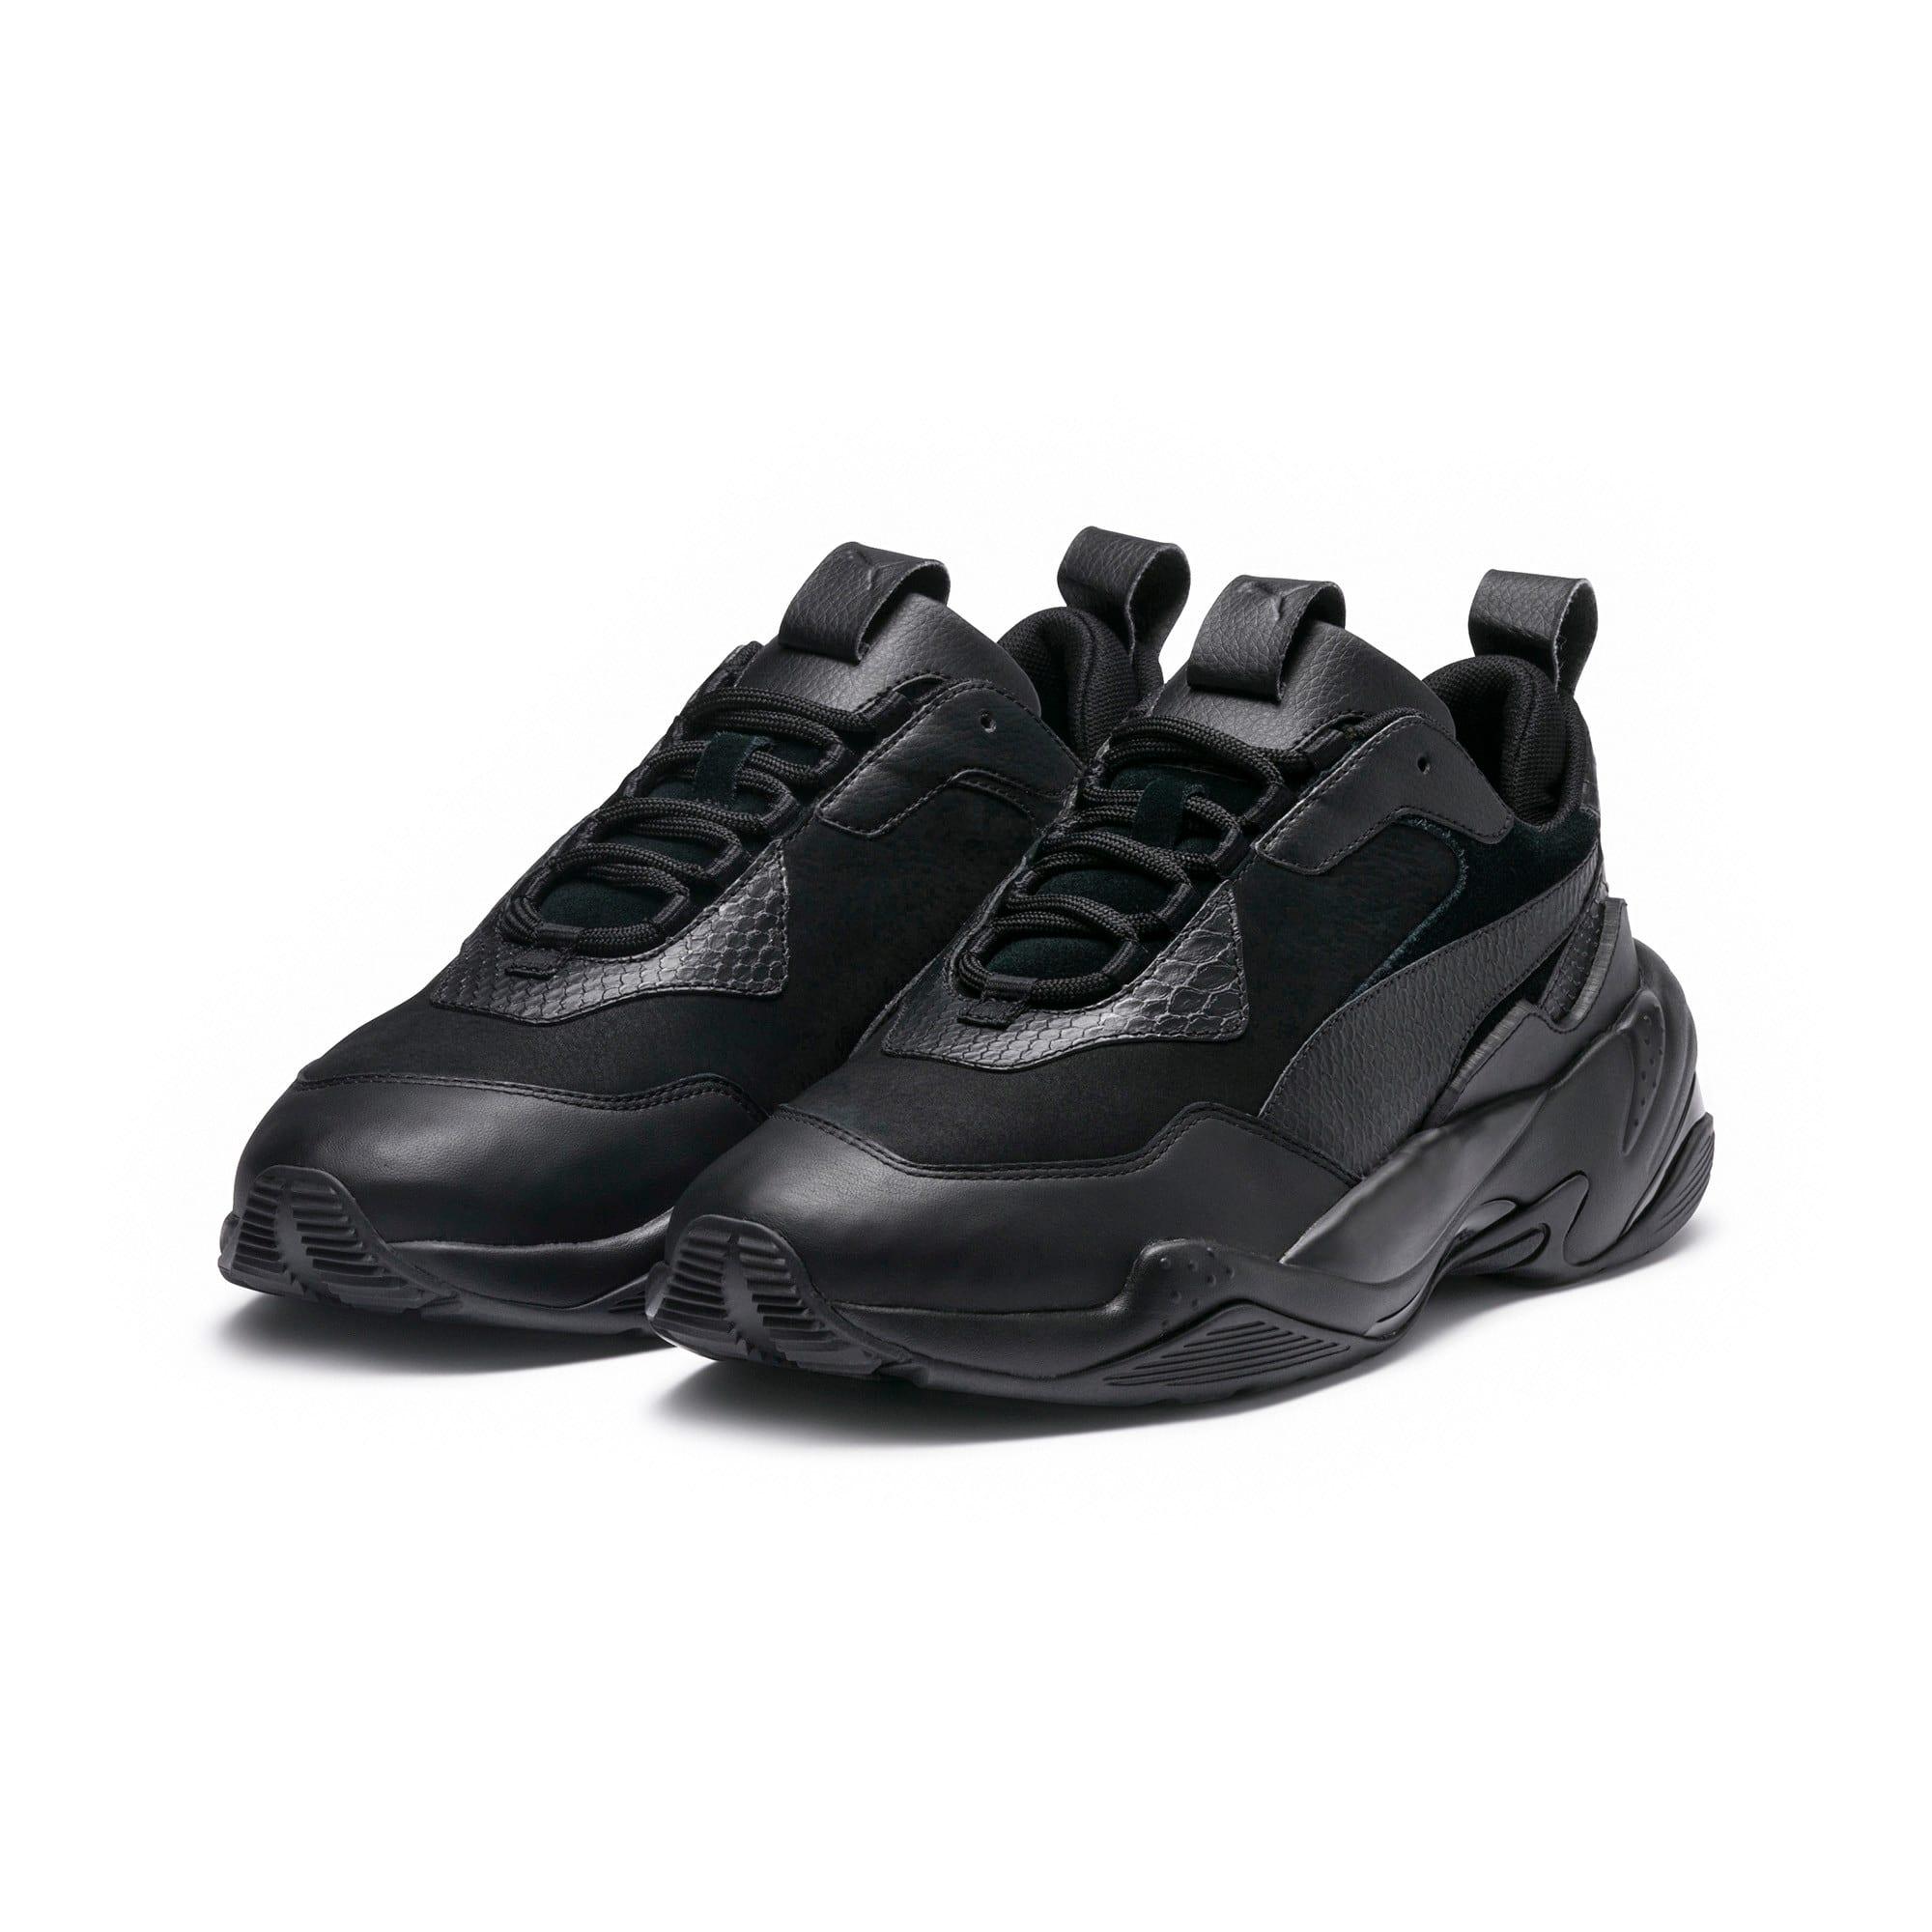 Thumbnail 2 of Thunder Desert Sneakers, Black-Puma Black-Black, medium